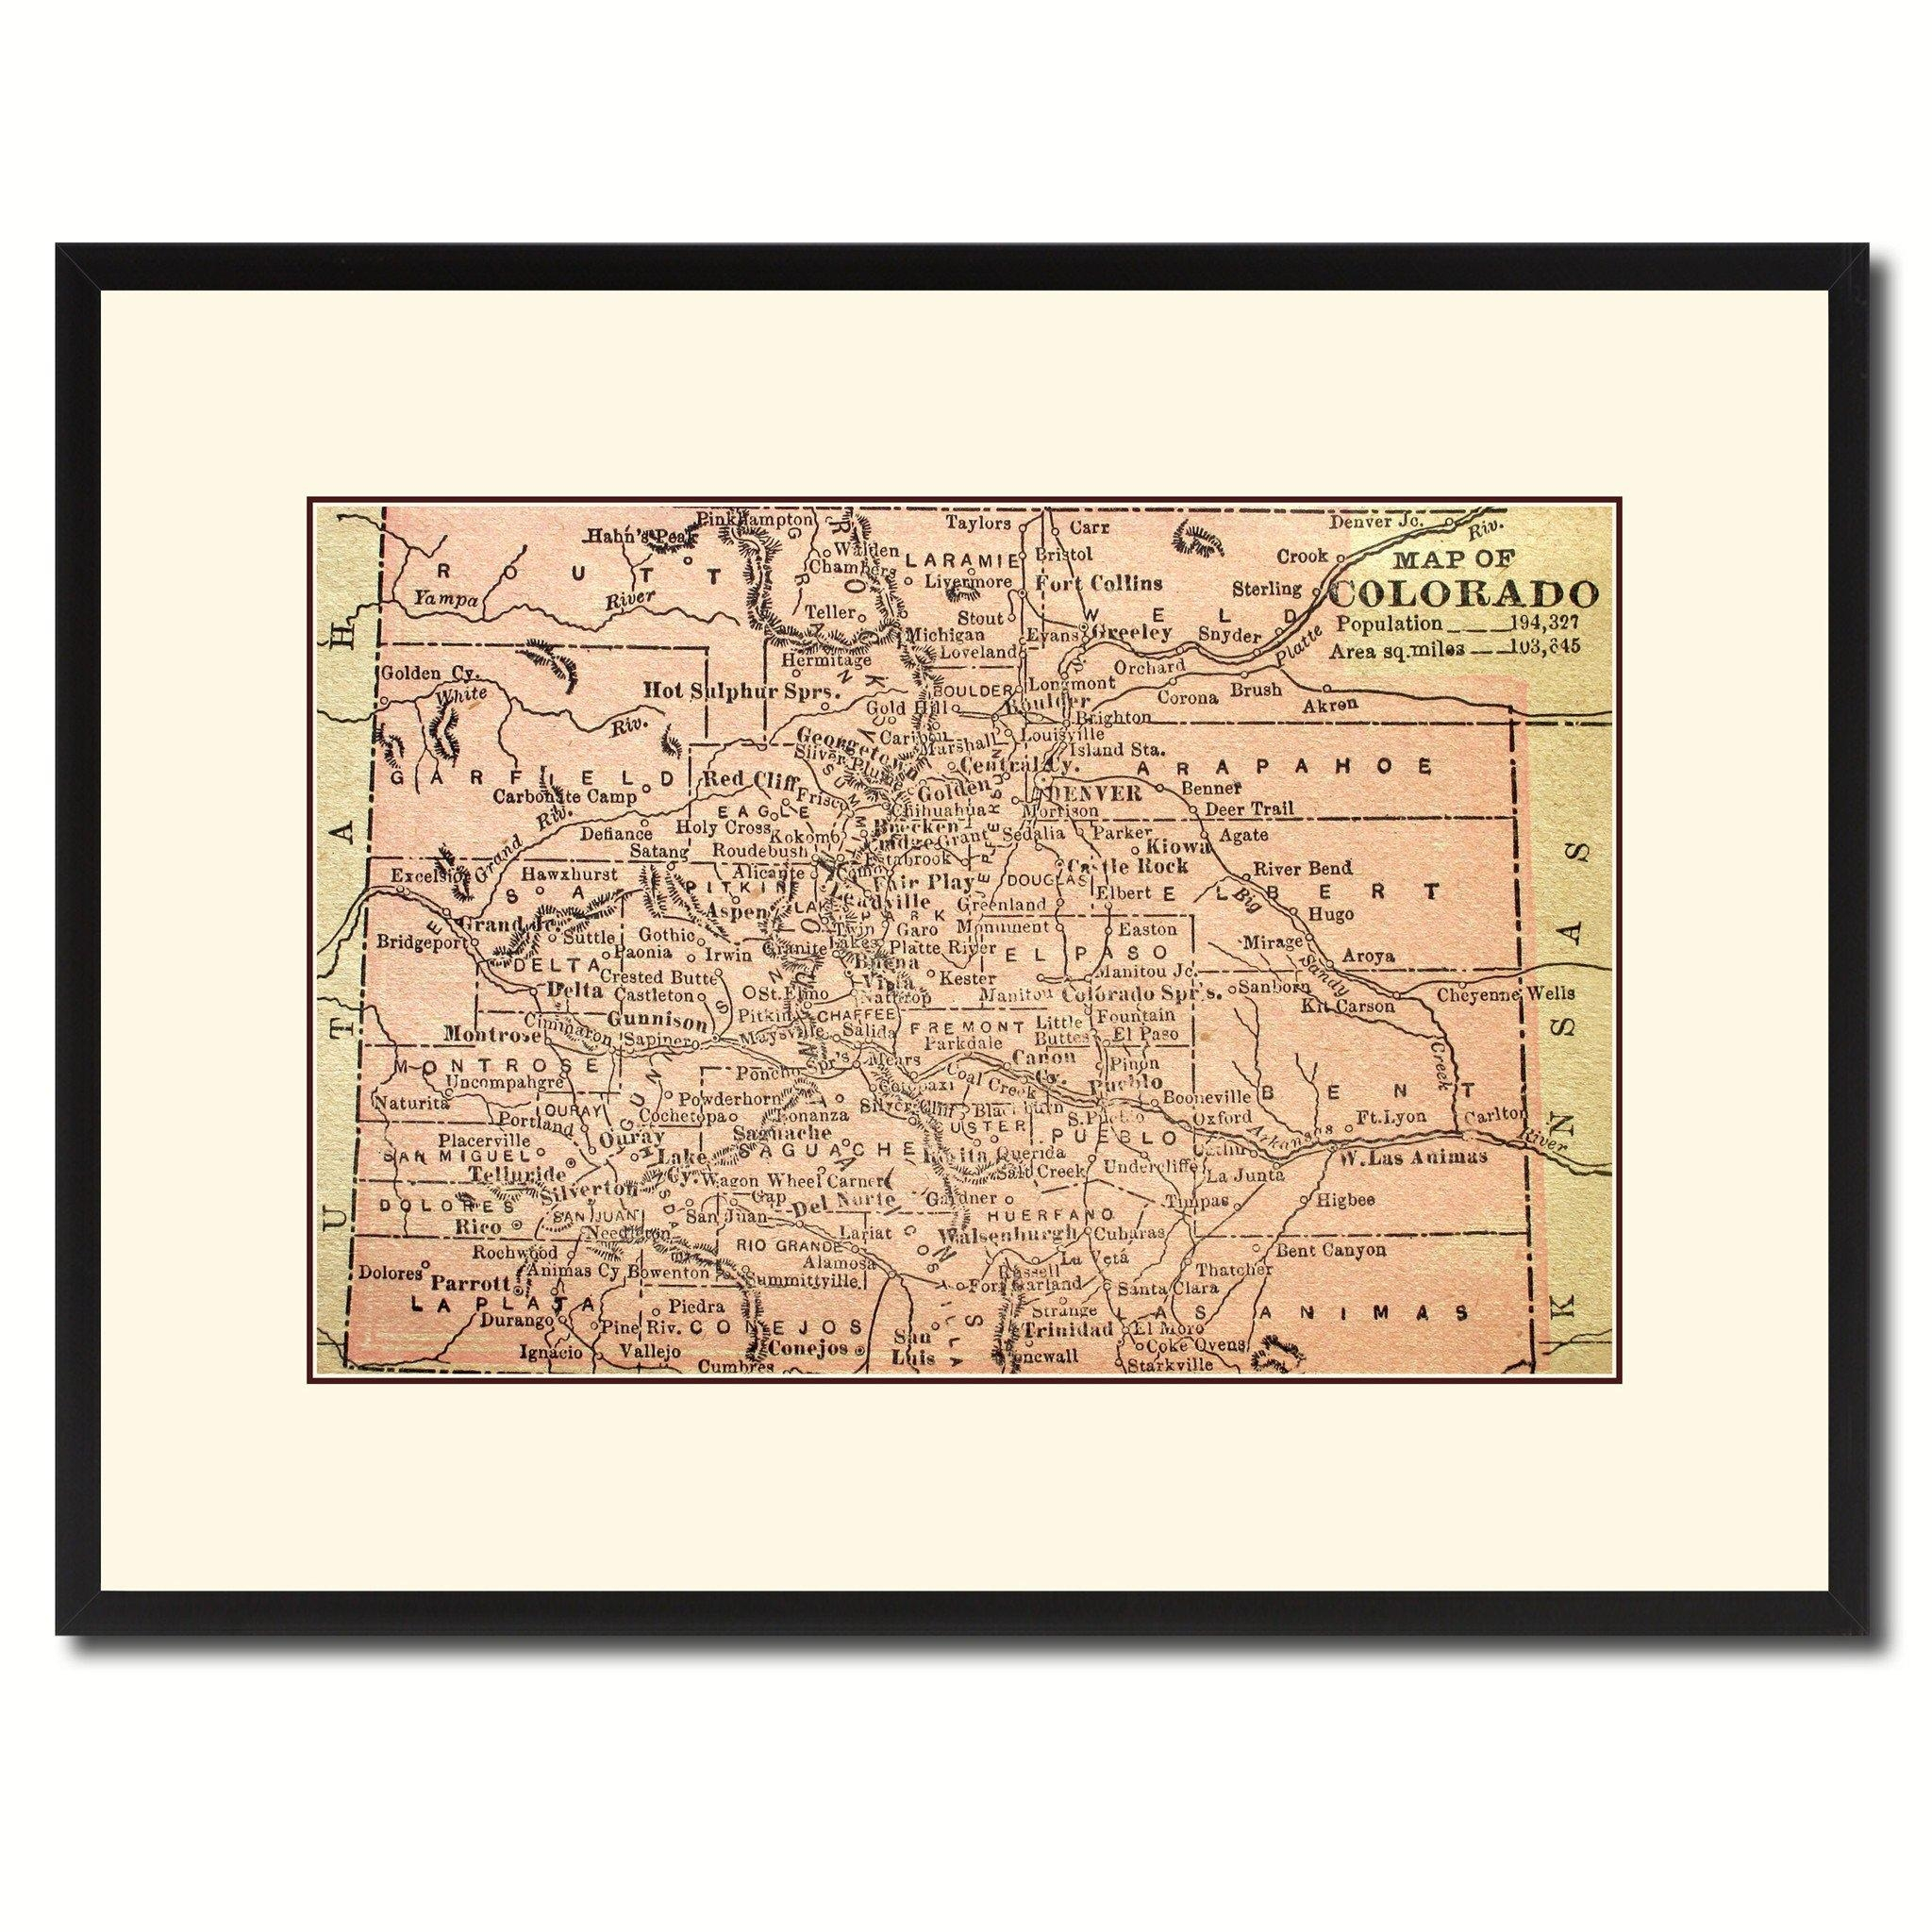 Colorado Vintage Antique Map Wall Art Home Decor Gift Ideas Canvas In Antique Map Wall Art (Image 5 of 20)